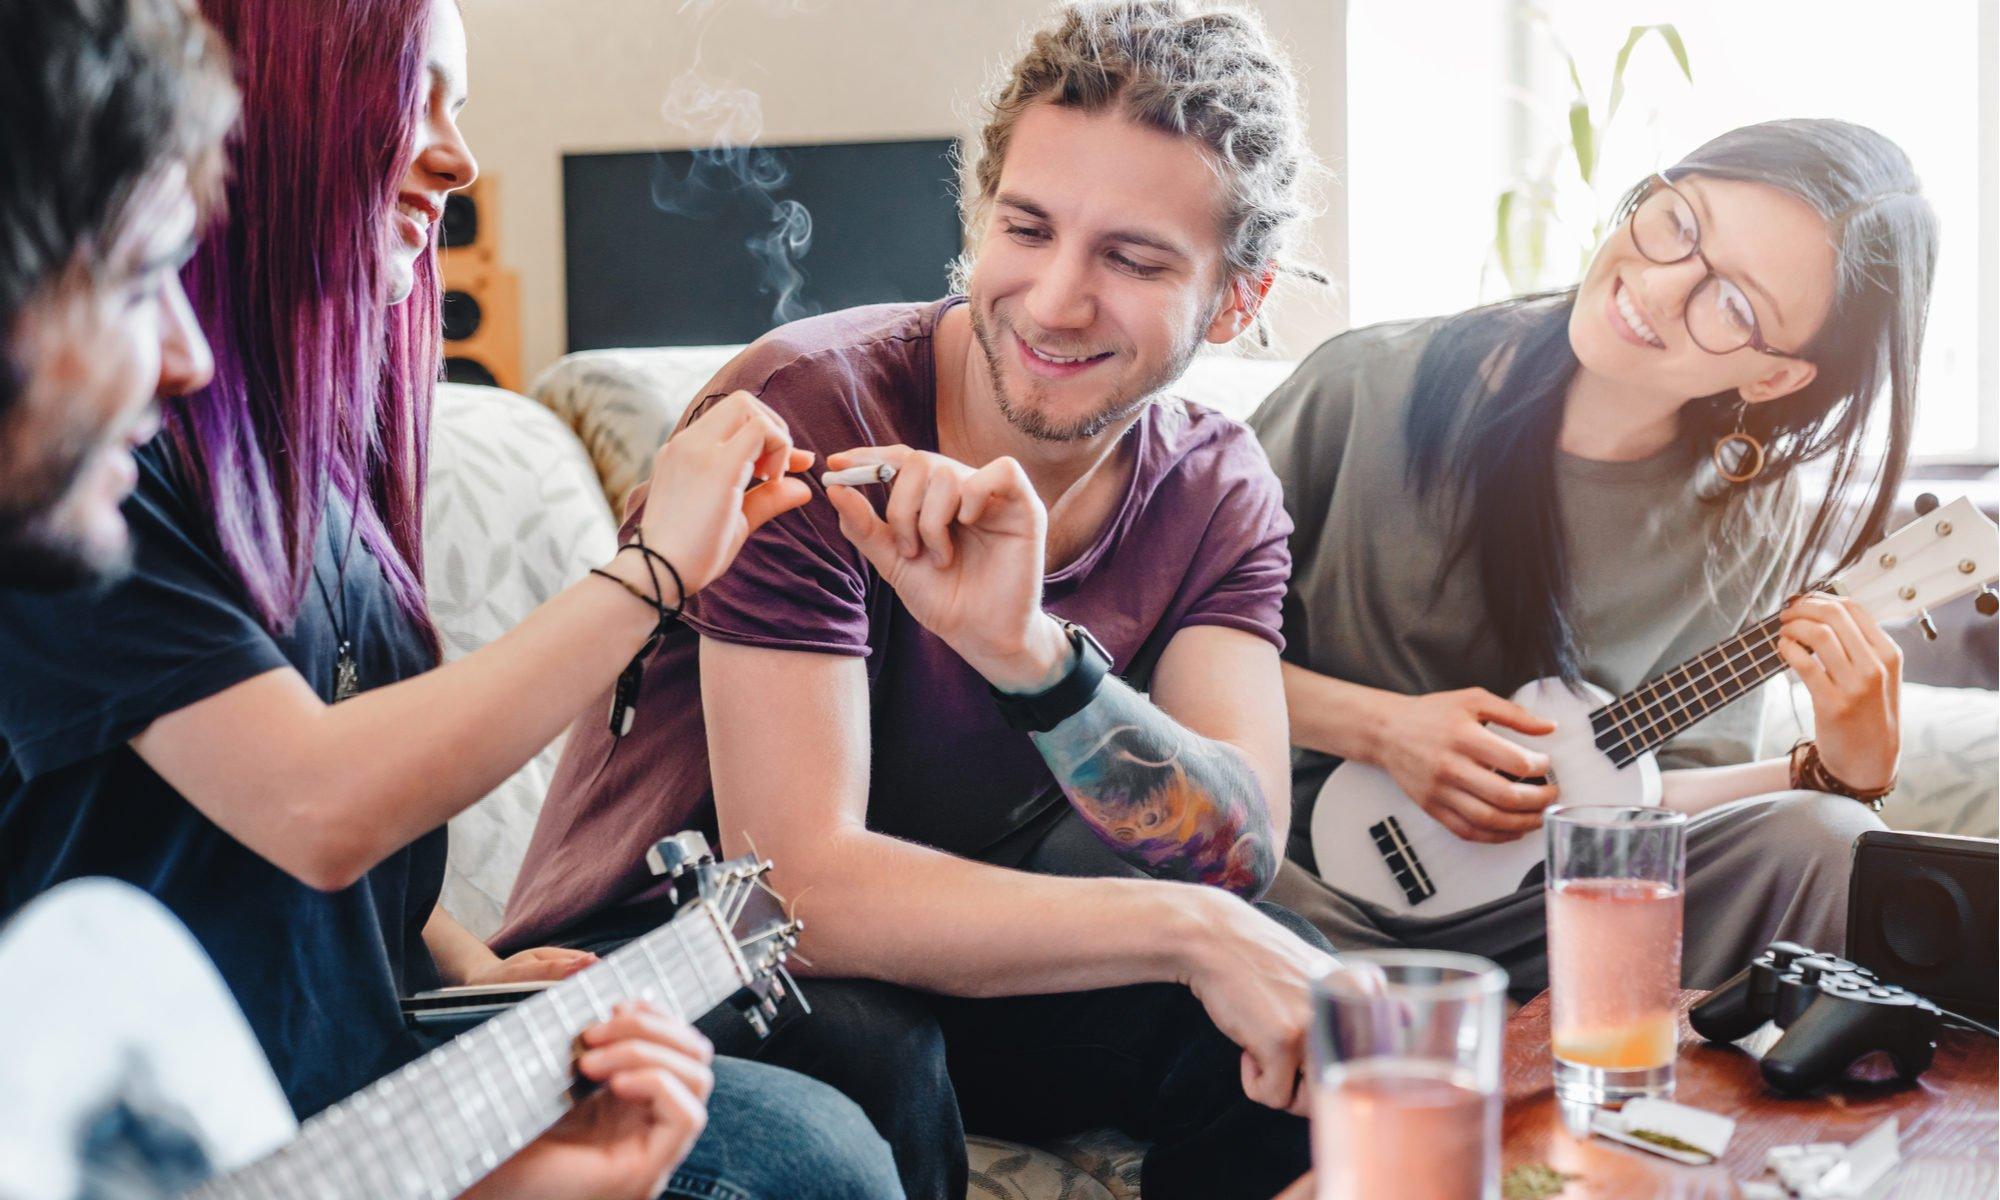 Smoking marijuana for the first time